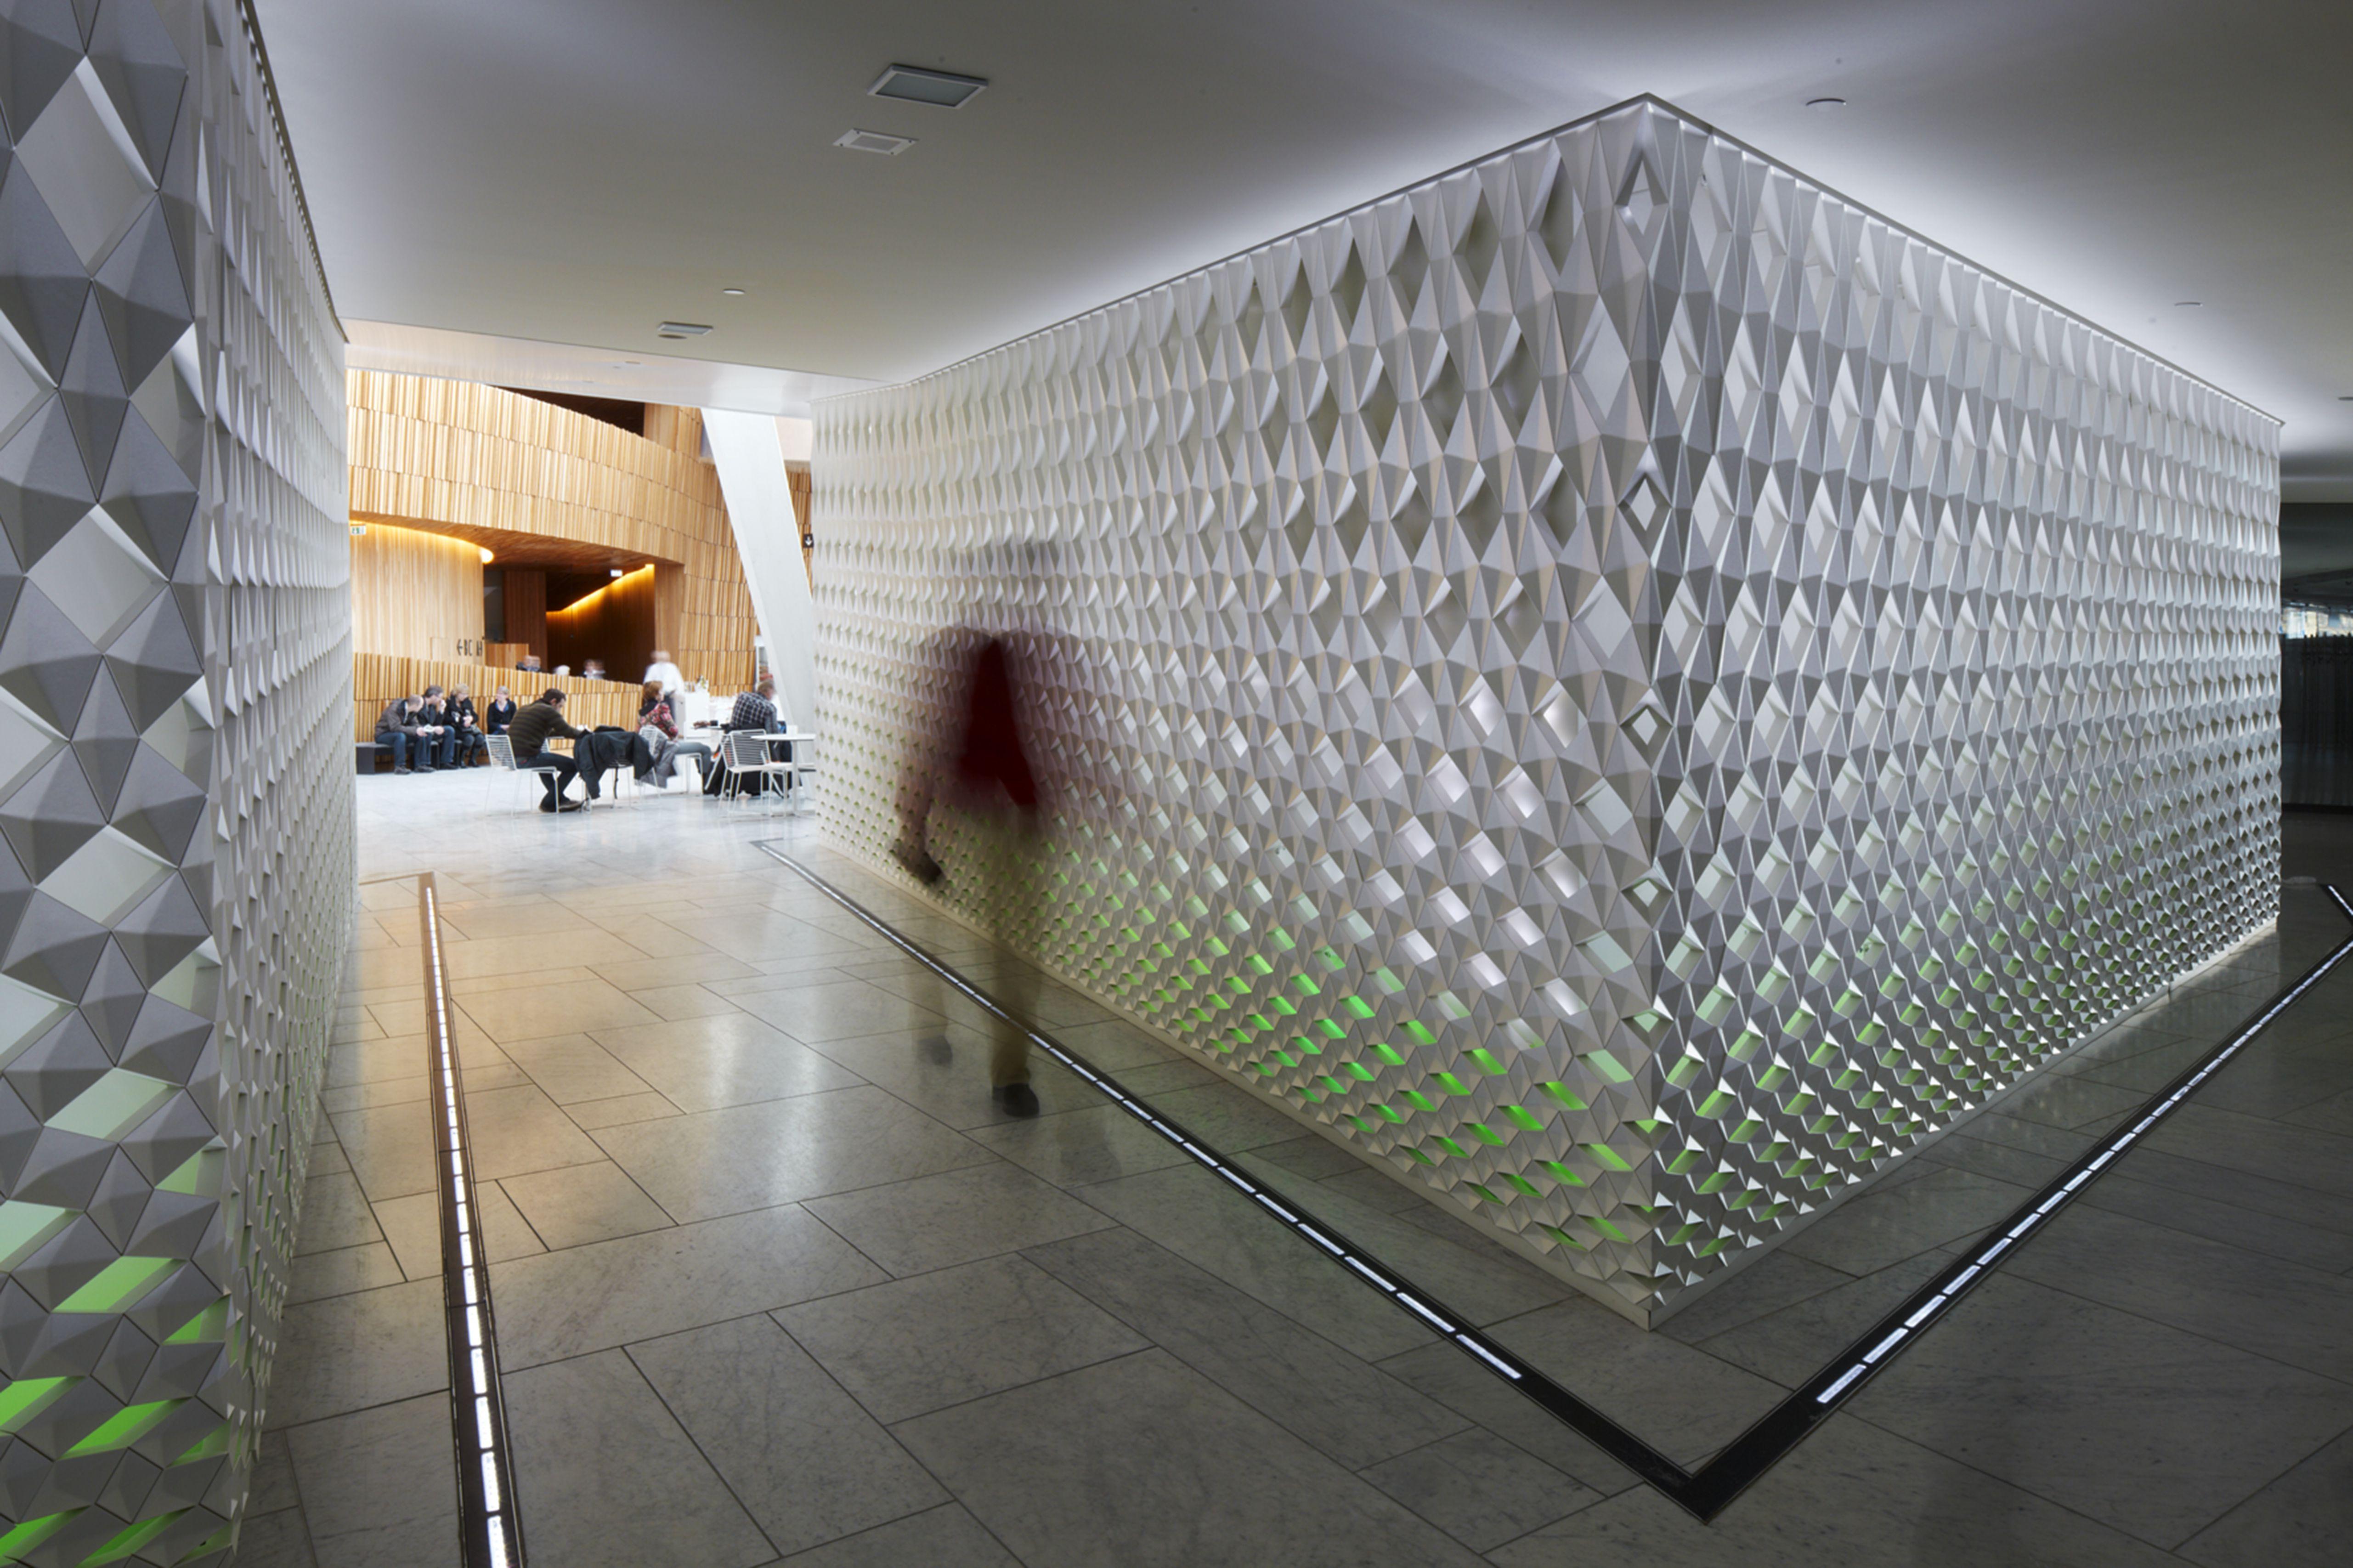 Illuminated Wall Panels at the Oslo Opera House